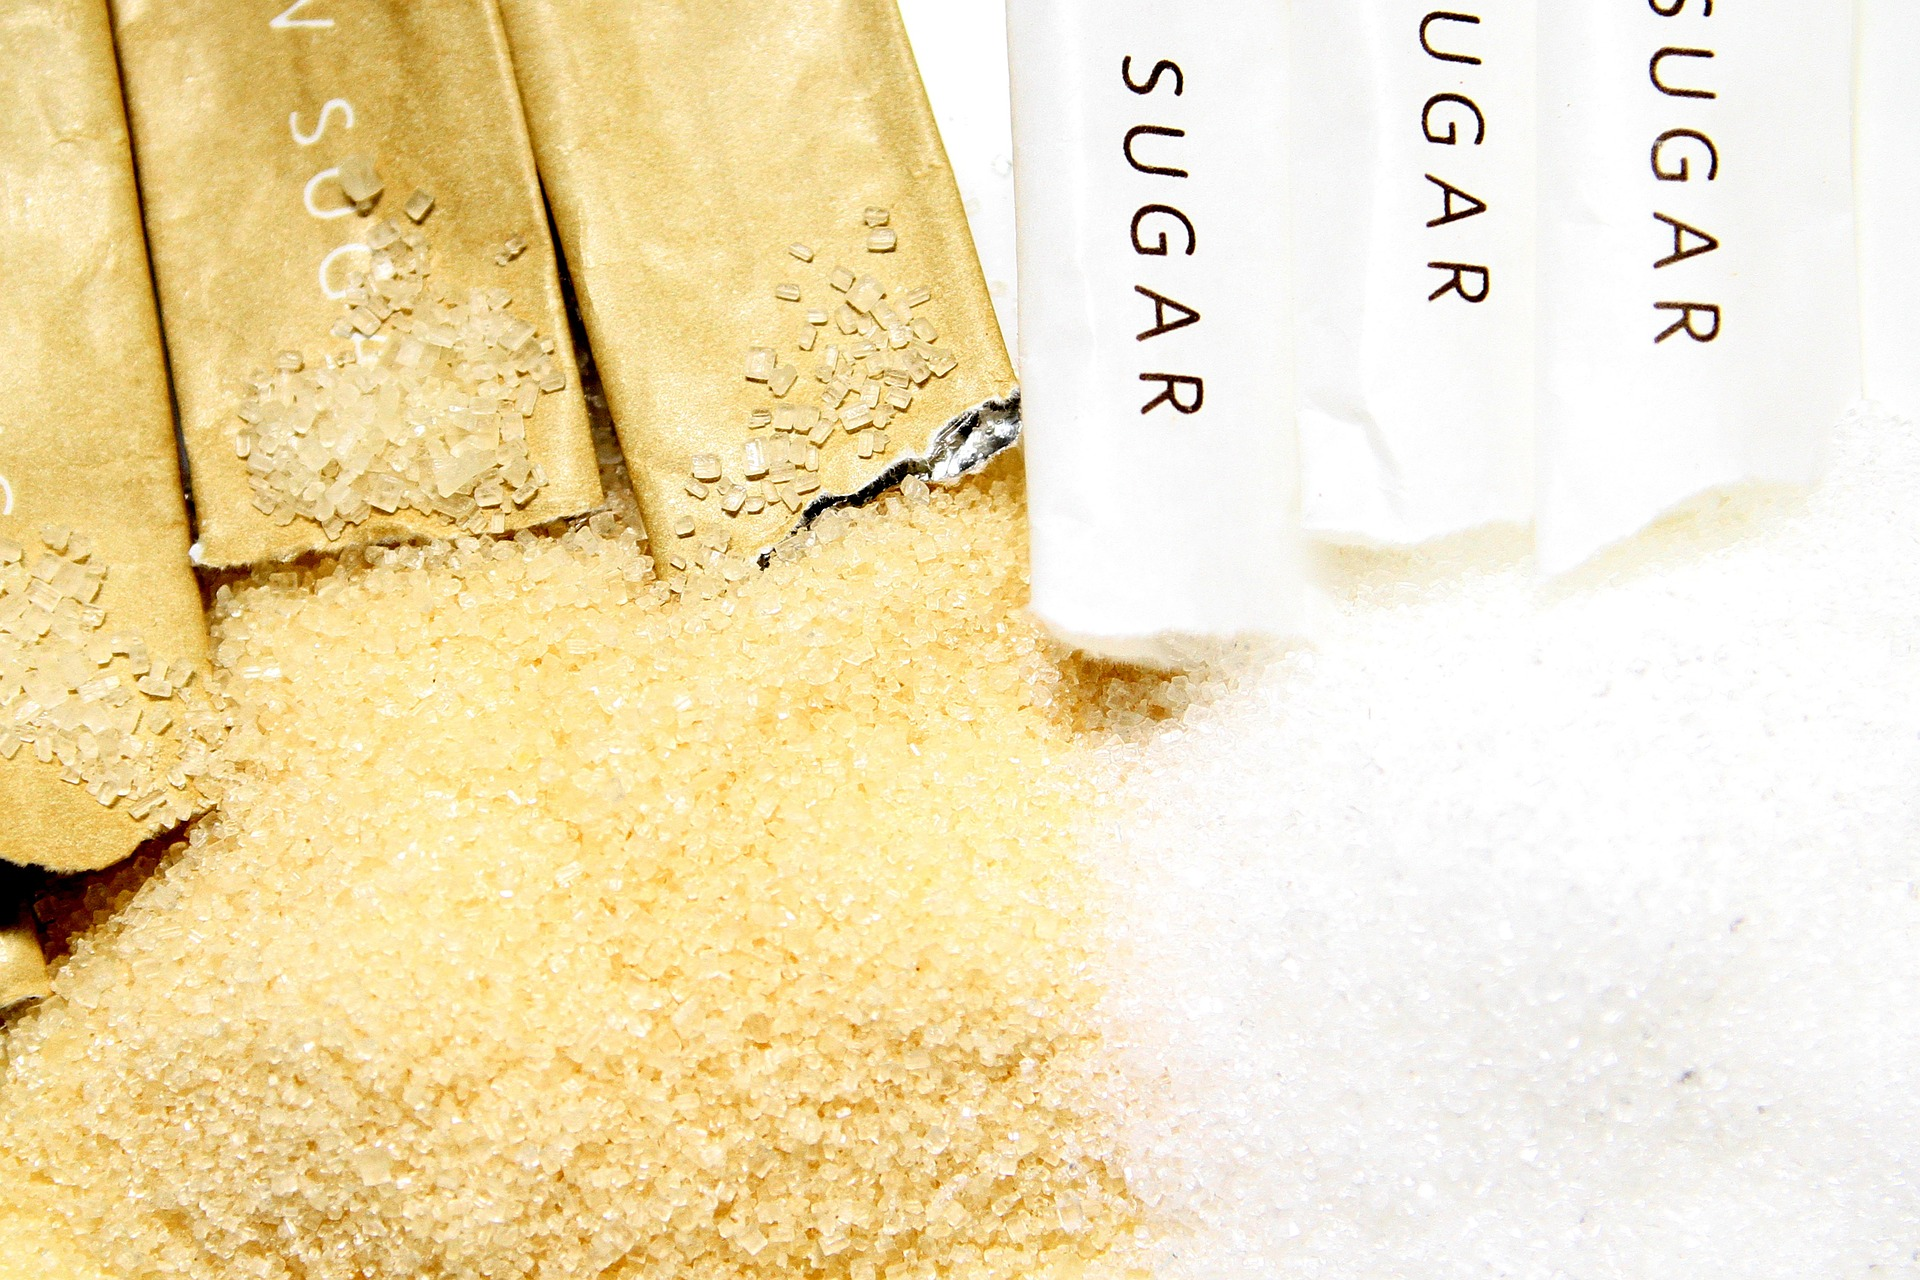 sugar-973899_1920.jpg